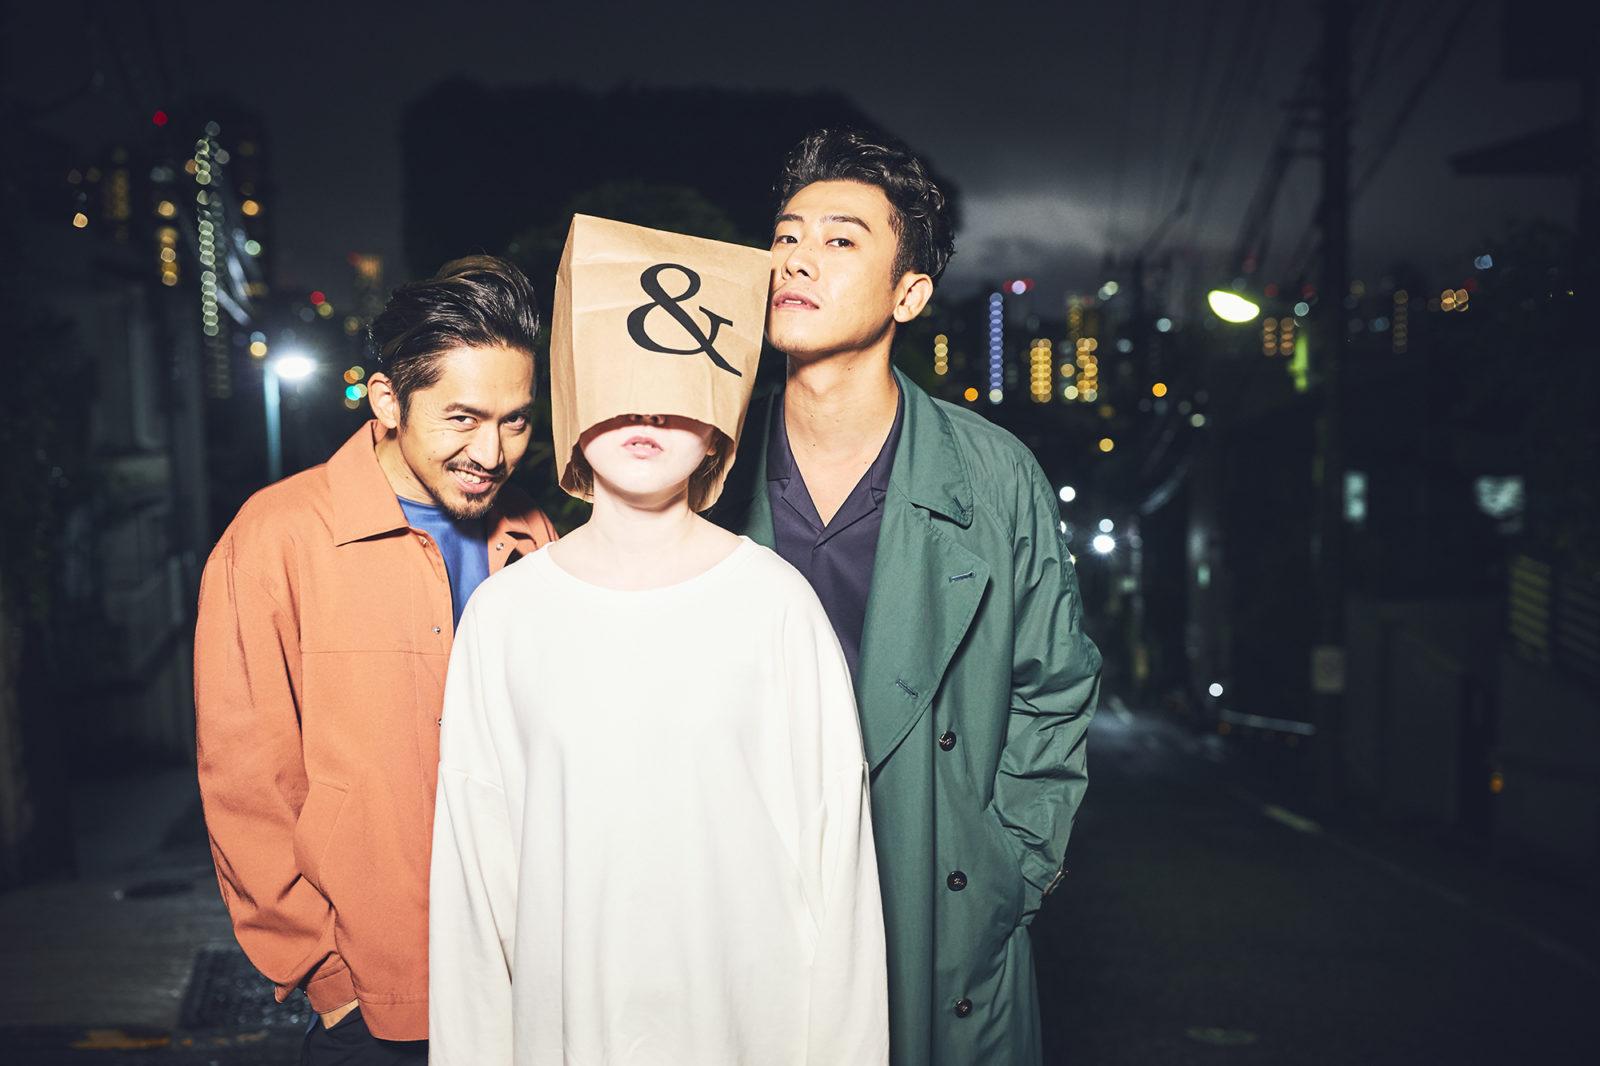 C&K 新曲「嗚呼、麗しき人生」MV、YouTubeプレミアにて7月24日(水)21時より配信決定